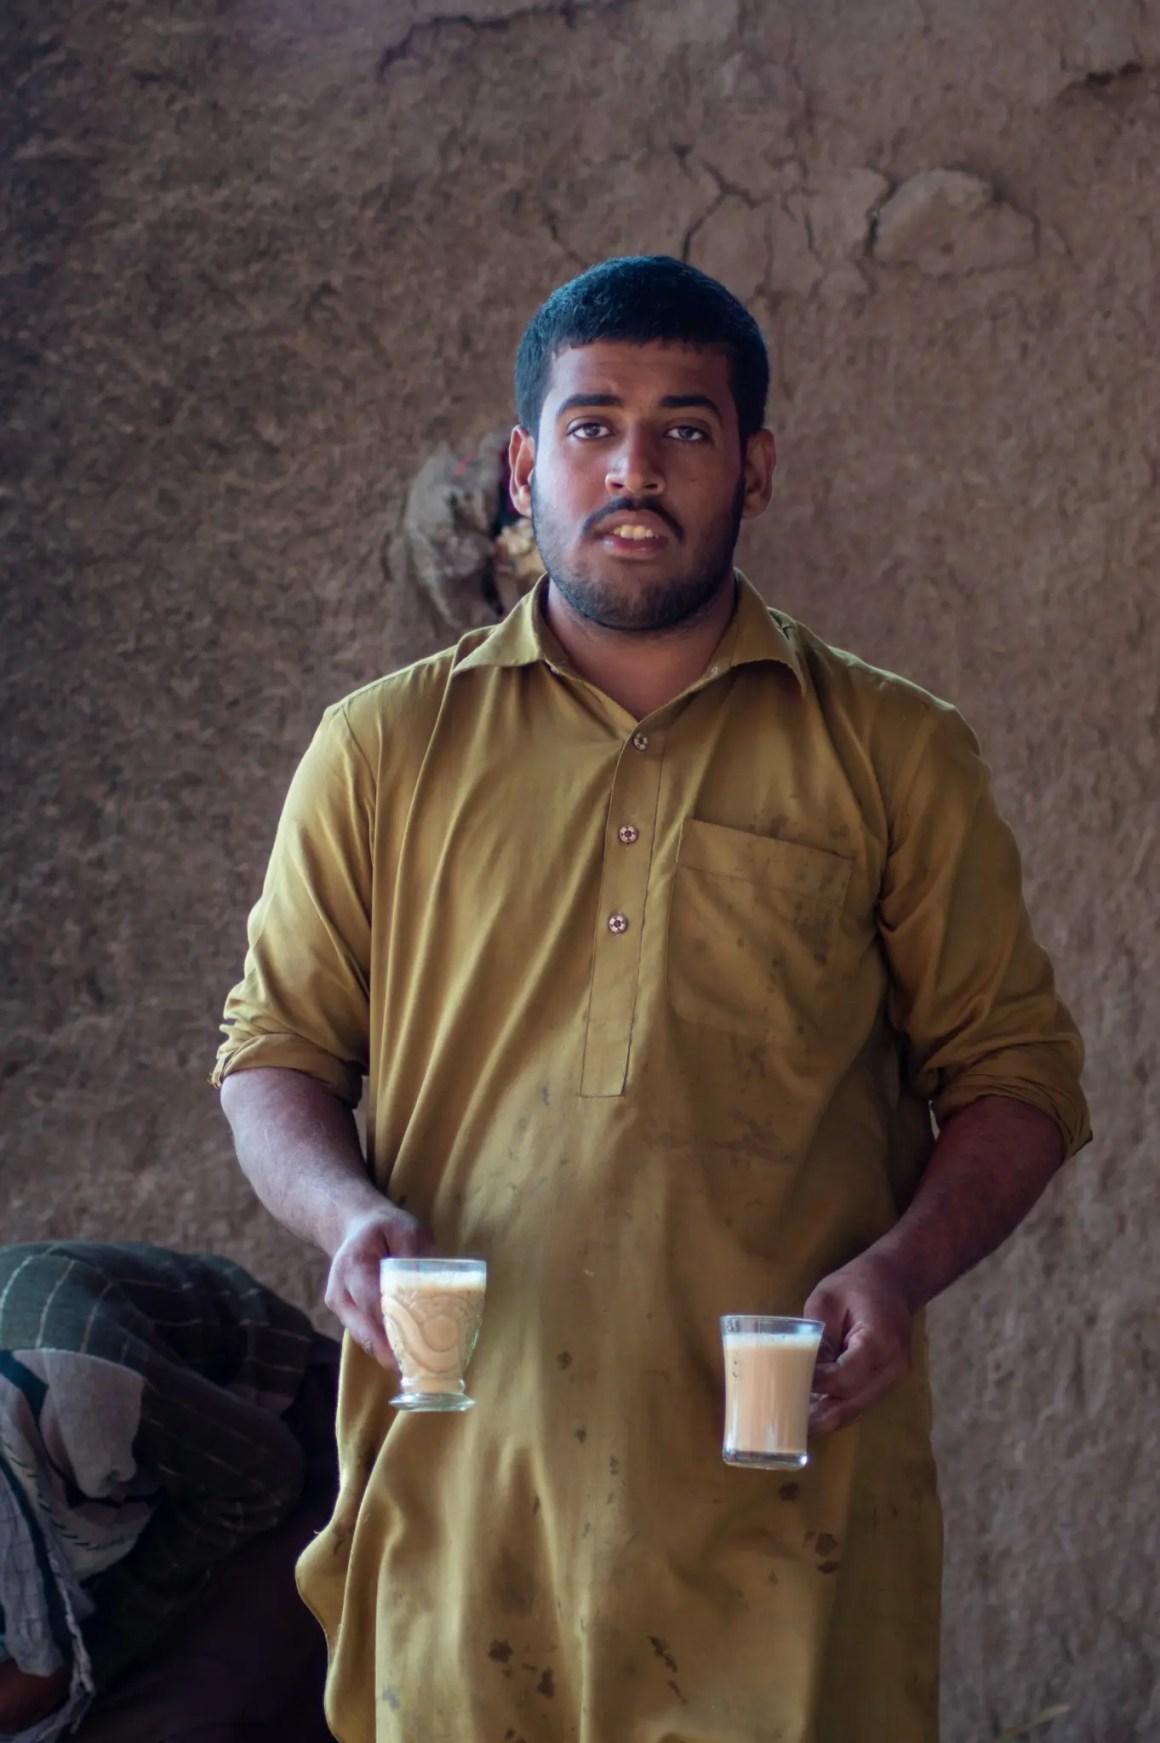 Theeverkoper in de Cholistan-woestijn